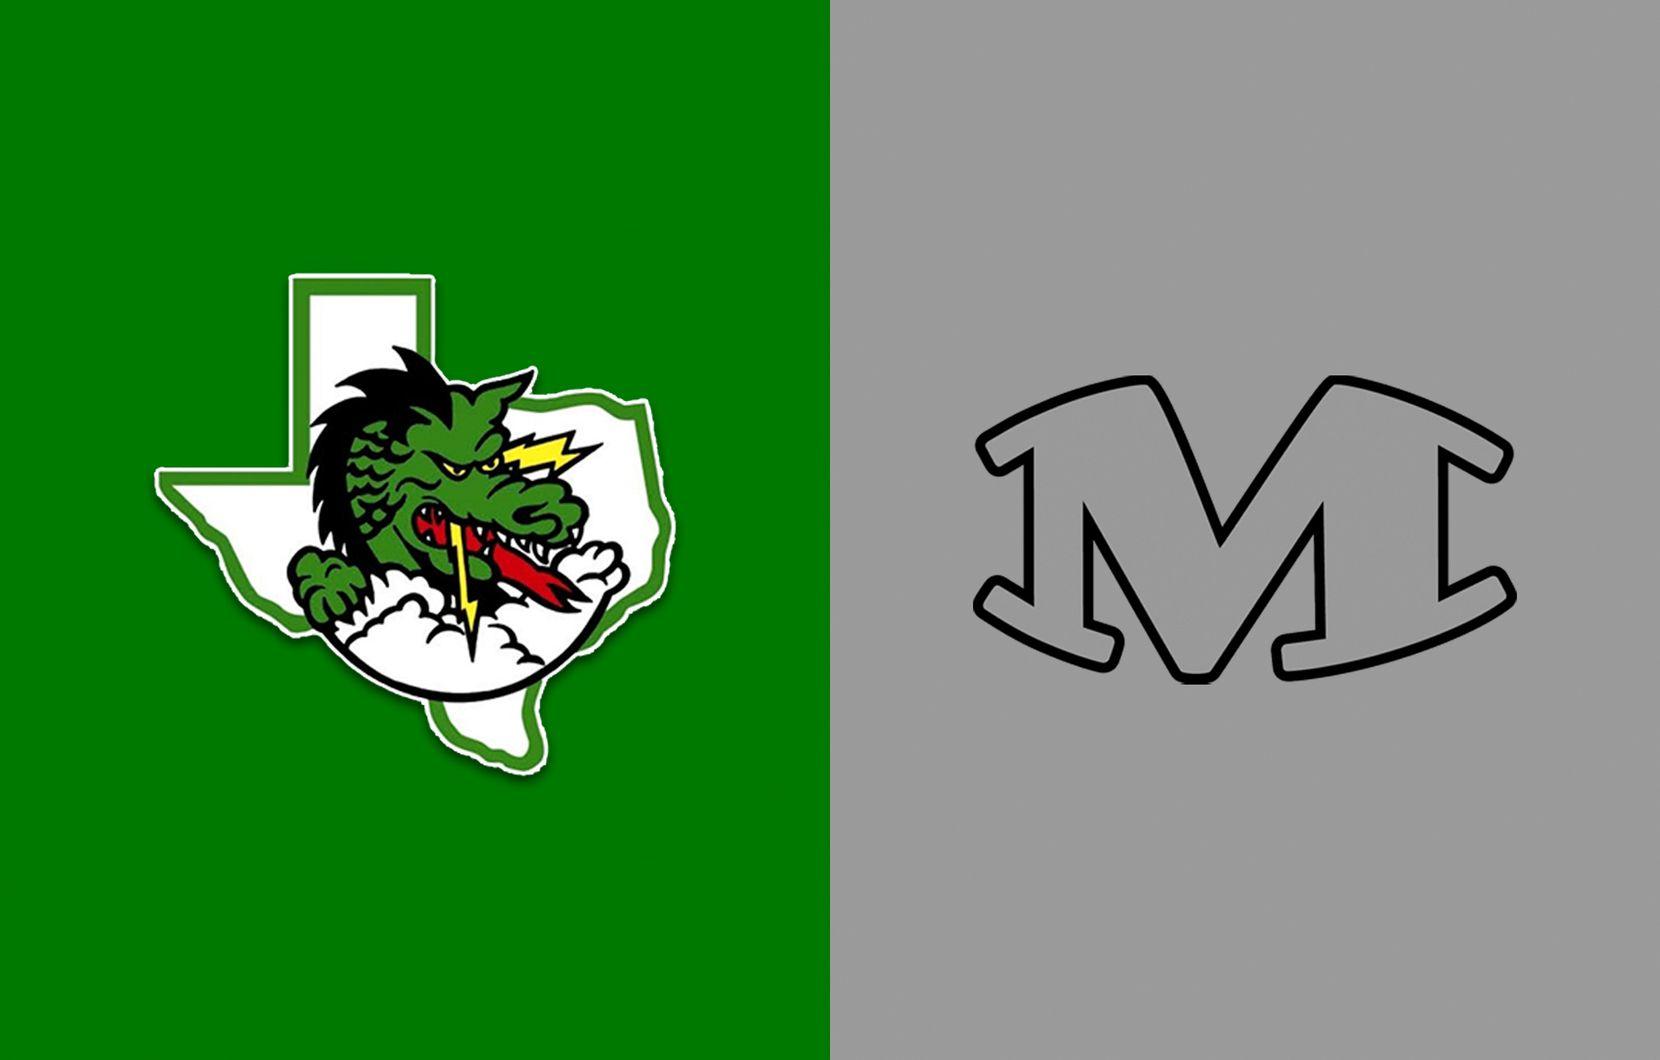 Southlake Carroll vs. Arlington Martin.